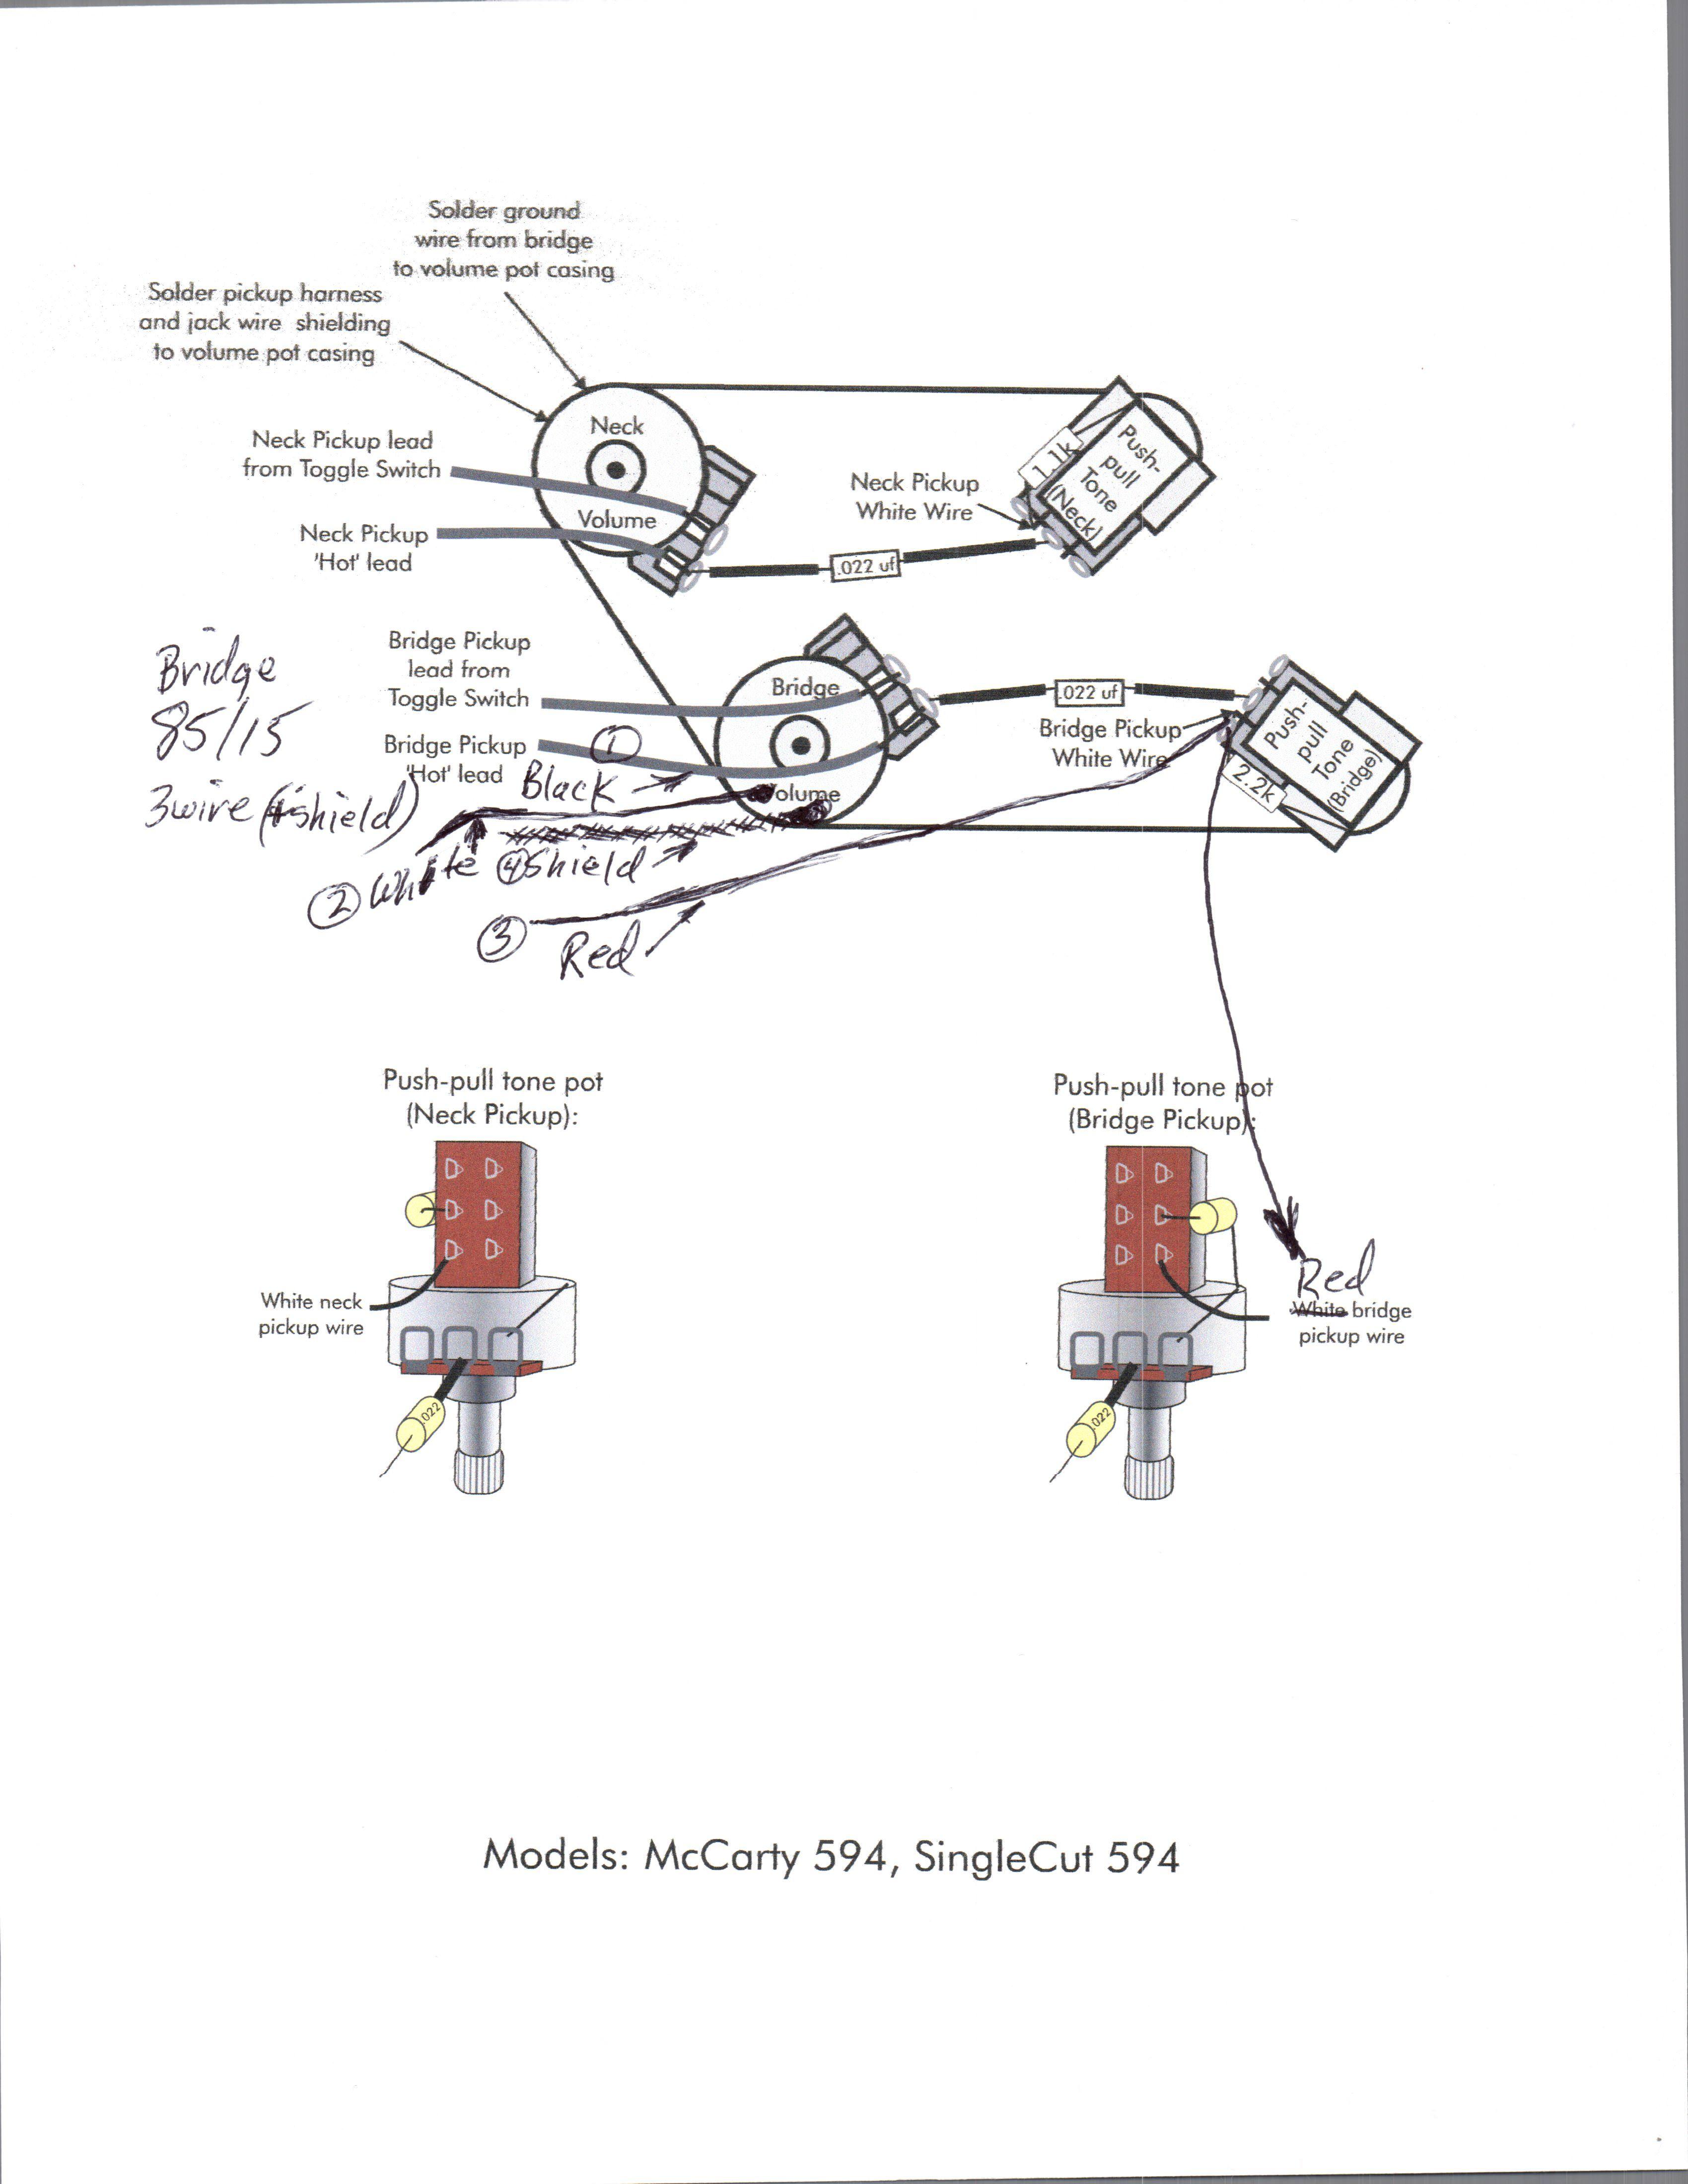 medium resolution of prs s2 wiring diagram wiring diagramprs s2 wiring diagram wiring diagram toolboxprs wiring diagram wiring diagram